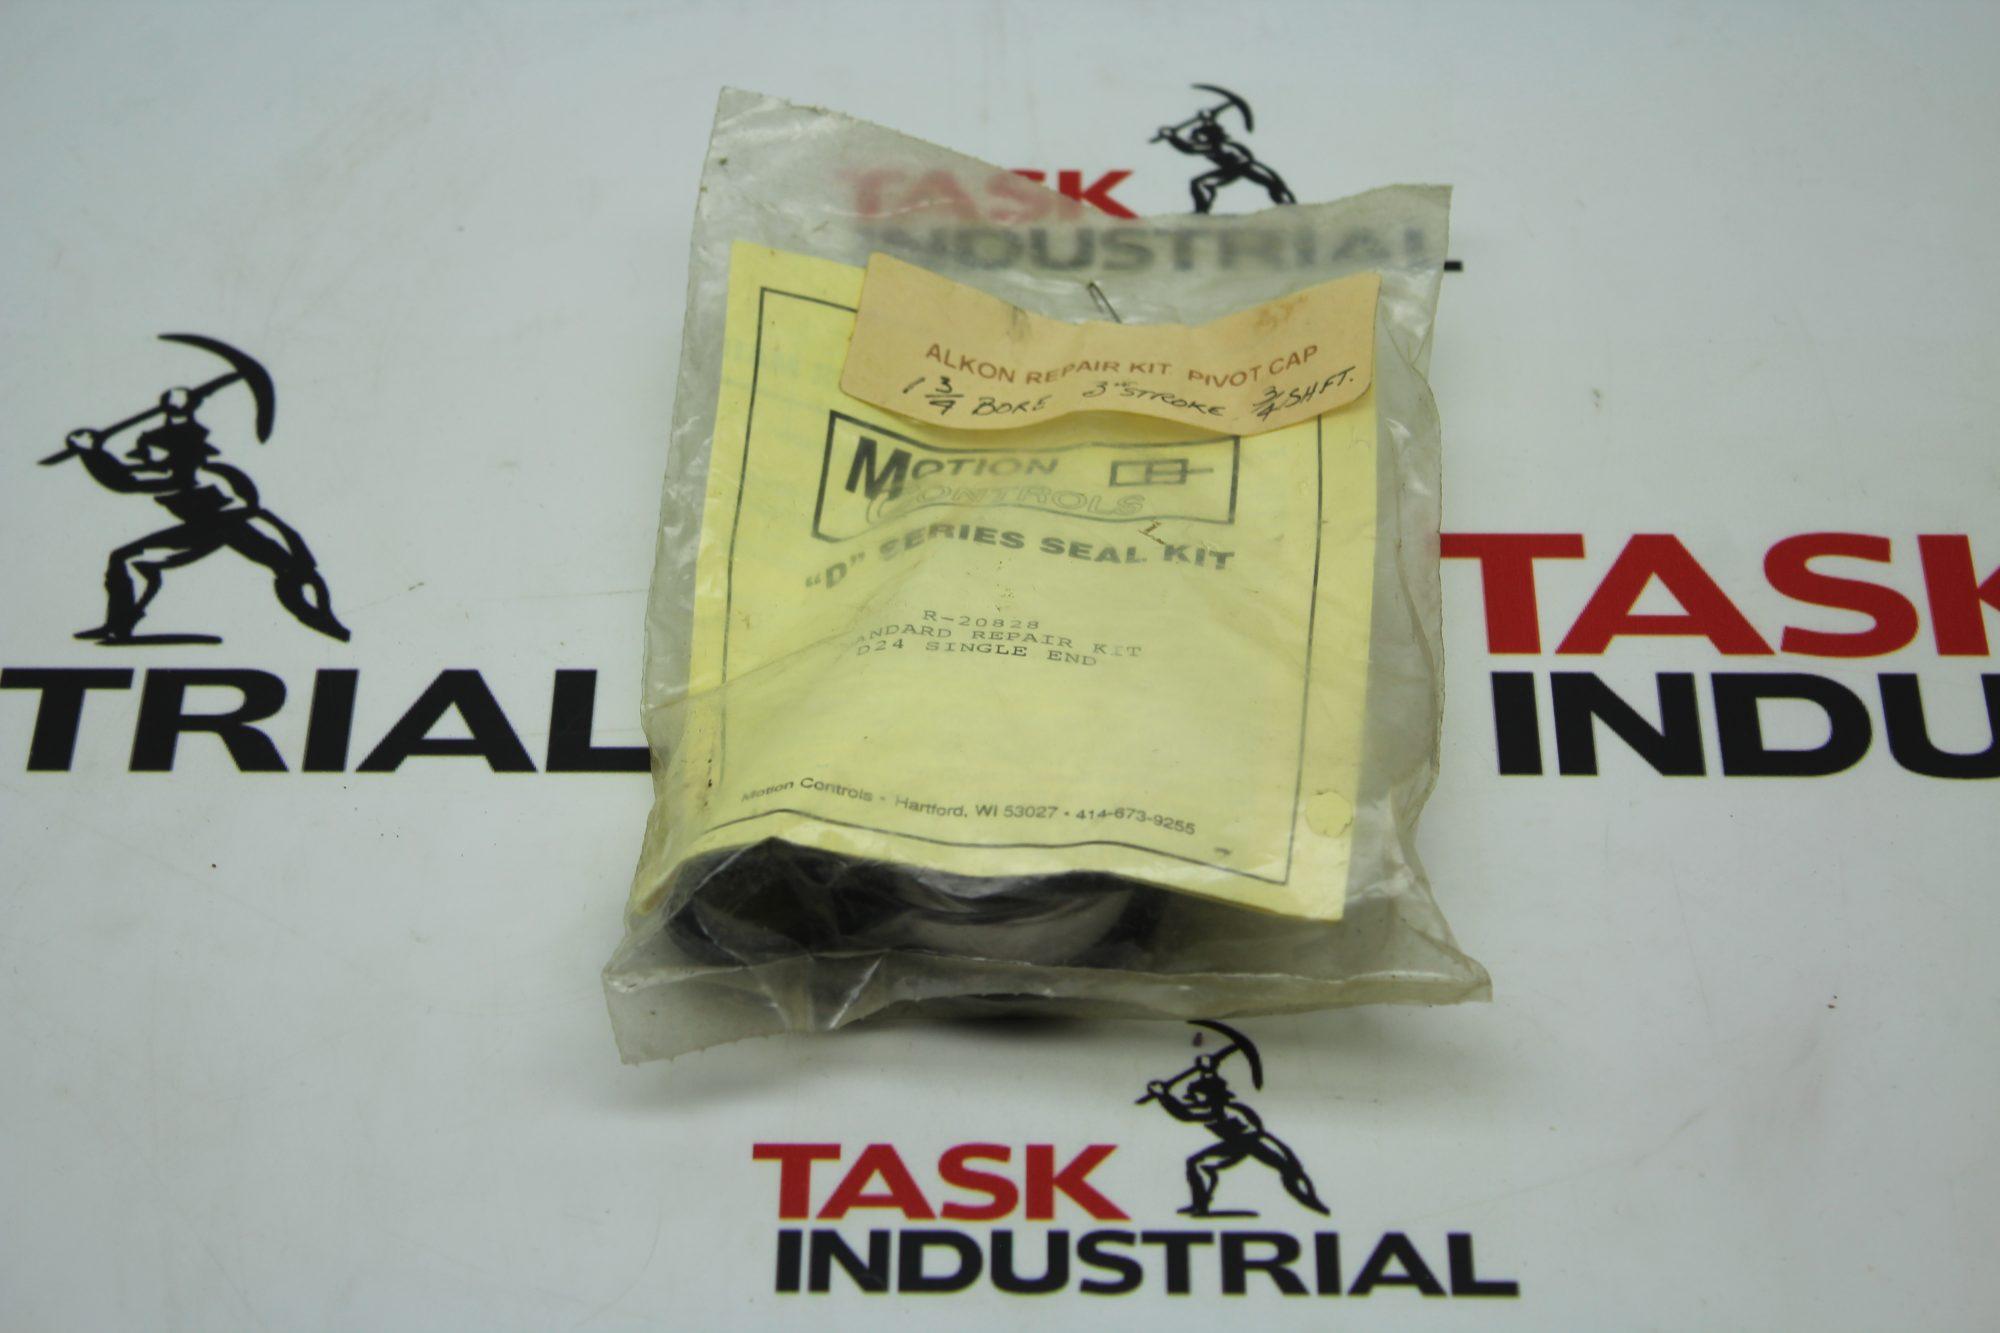 Motion Controls D Series Seal Kit R-20828 D24 Single End